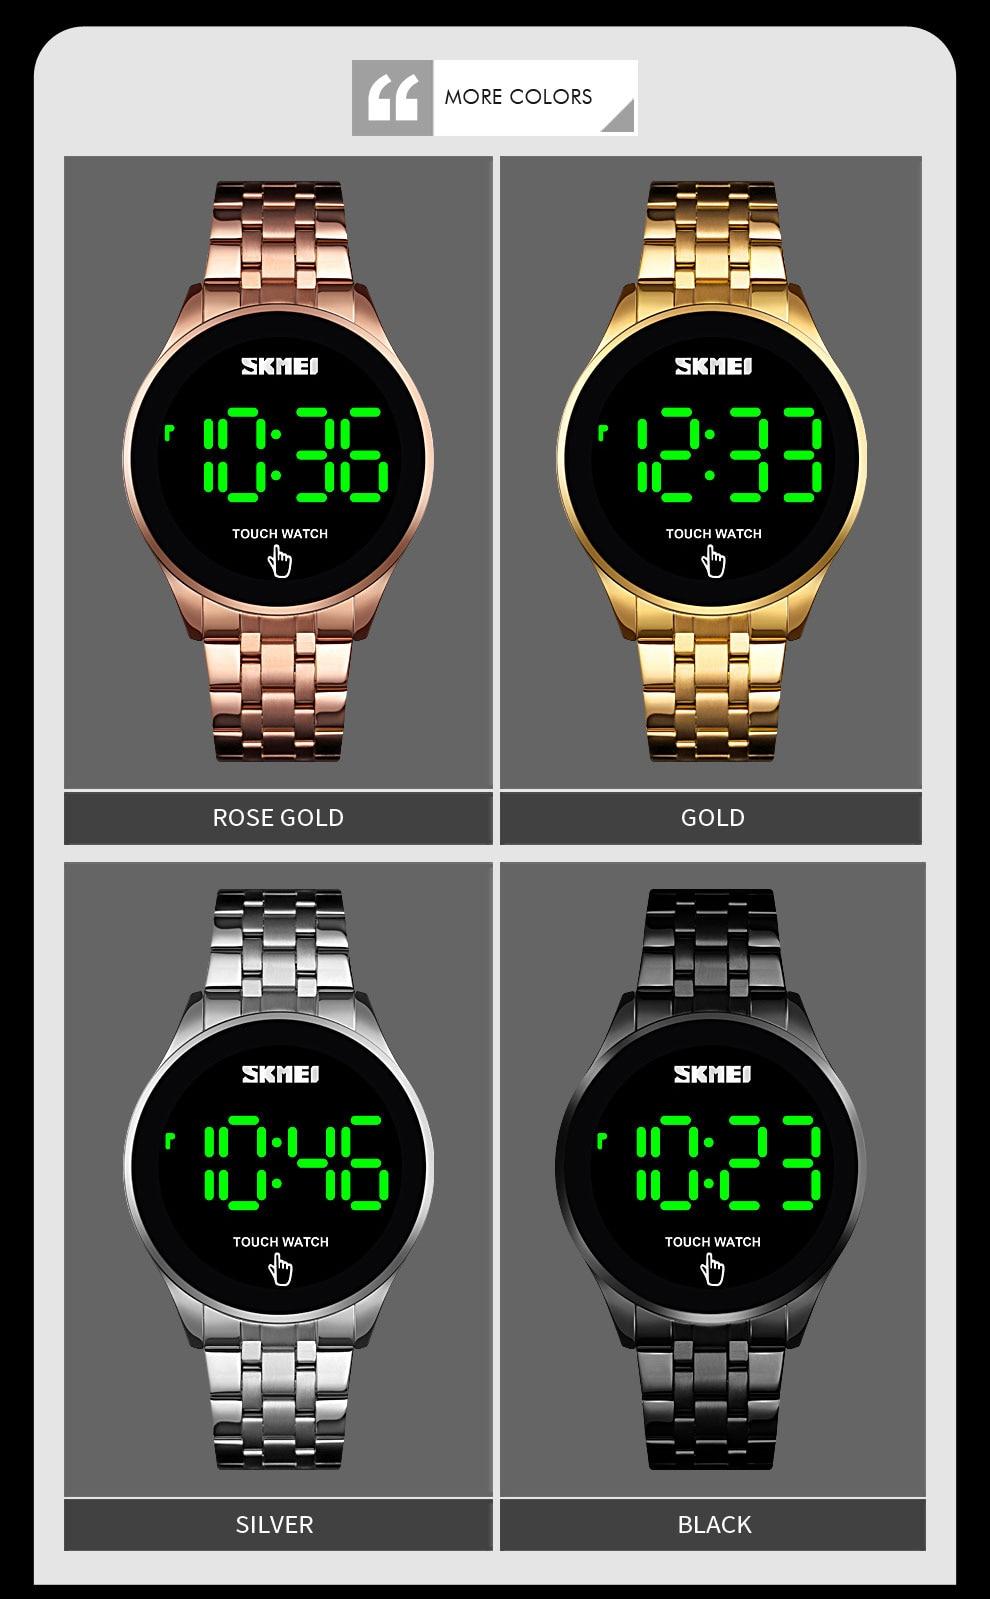 SKMEI 1579 Touch Screen LED Digital Watch 7